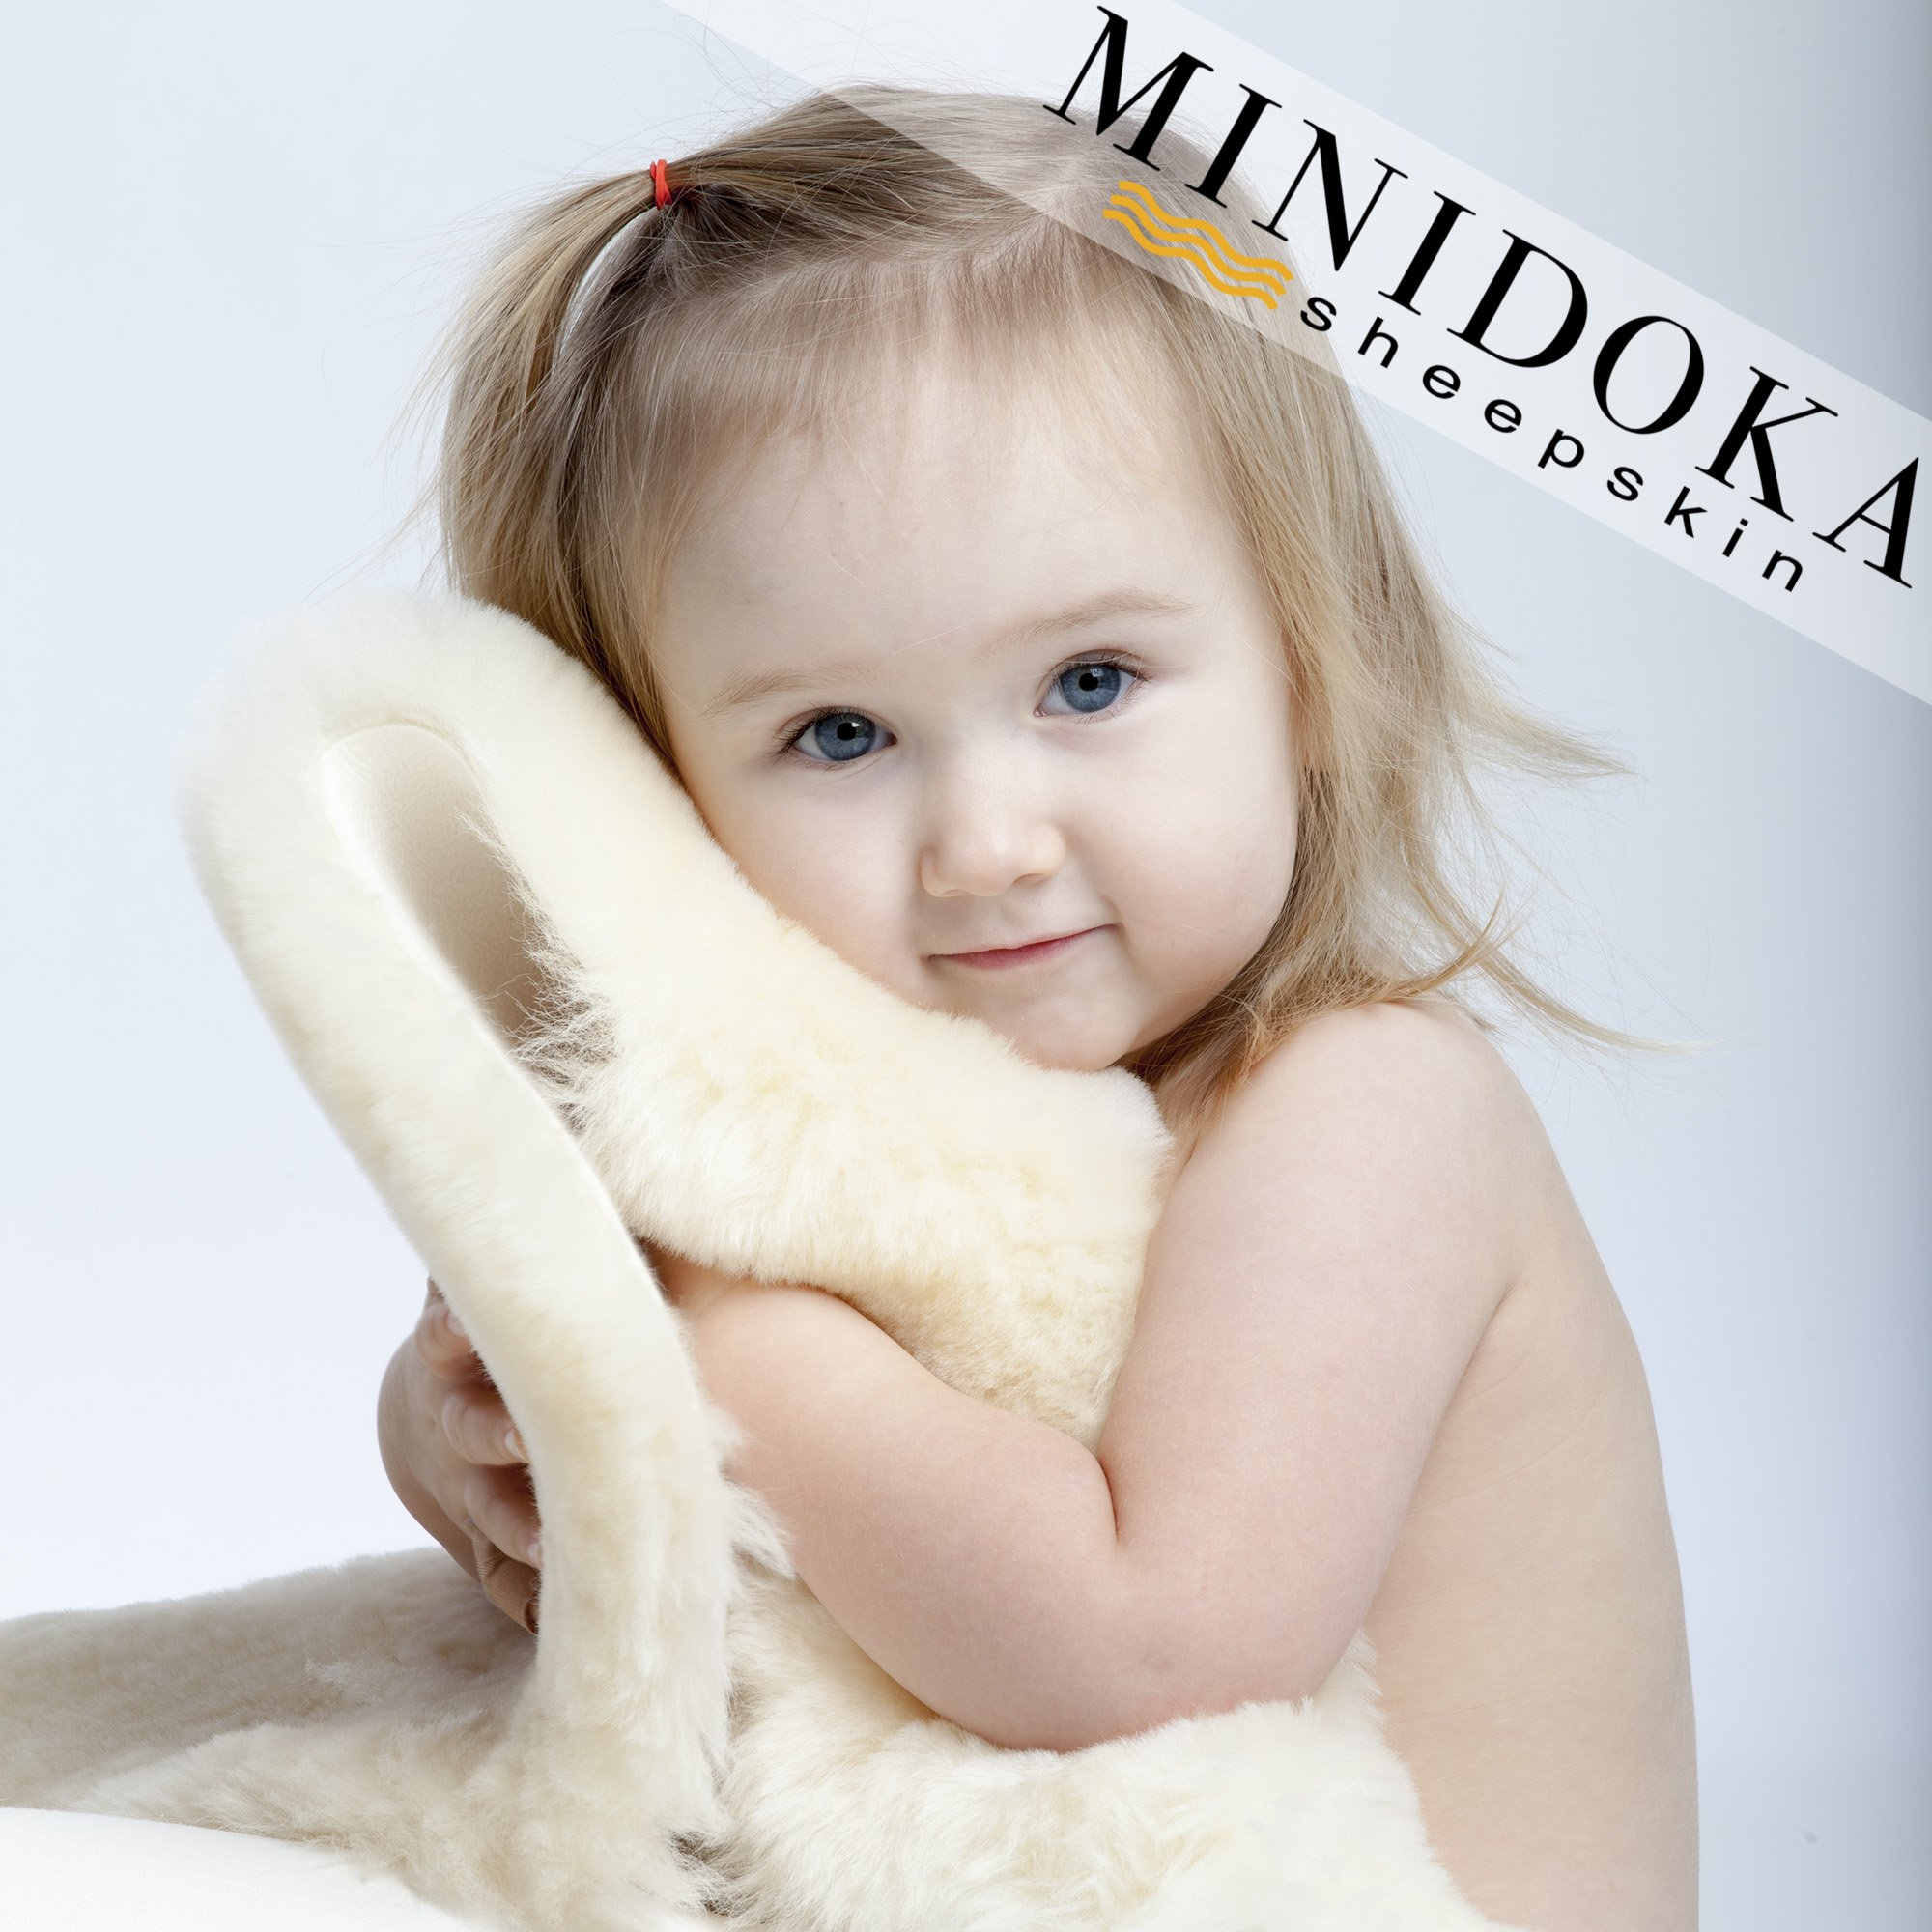 XL Australian Lambskin Baby Rug, Cornsilk Cream Color, 100% Natural, 37+ inches Long, Premium Quality, Plush Silky Soft Wool, by Minidoka Sheepskin by Desert Breeze Distributing